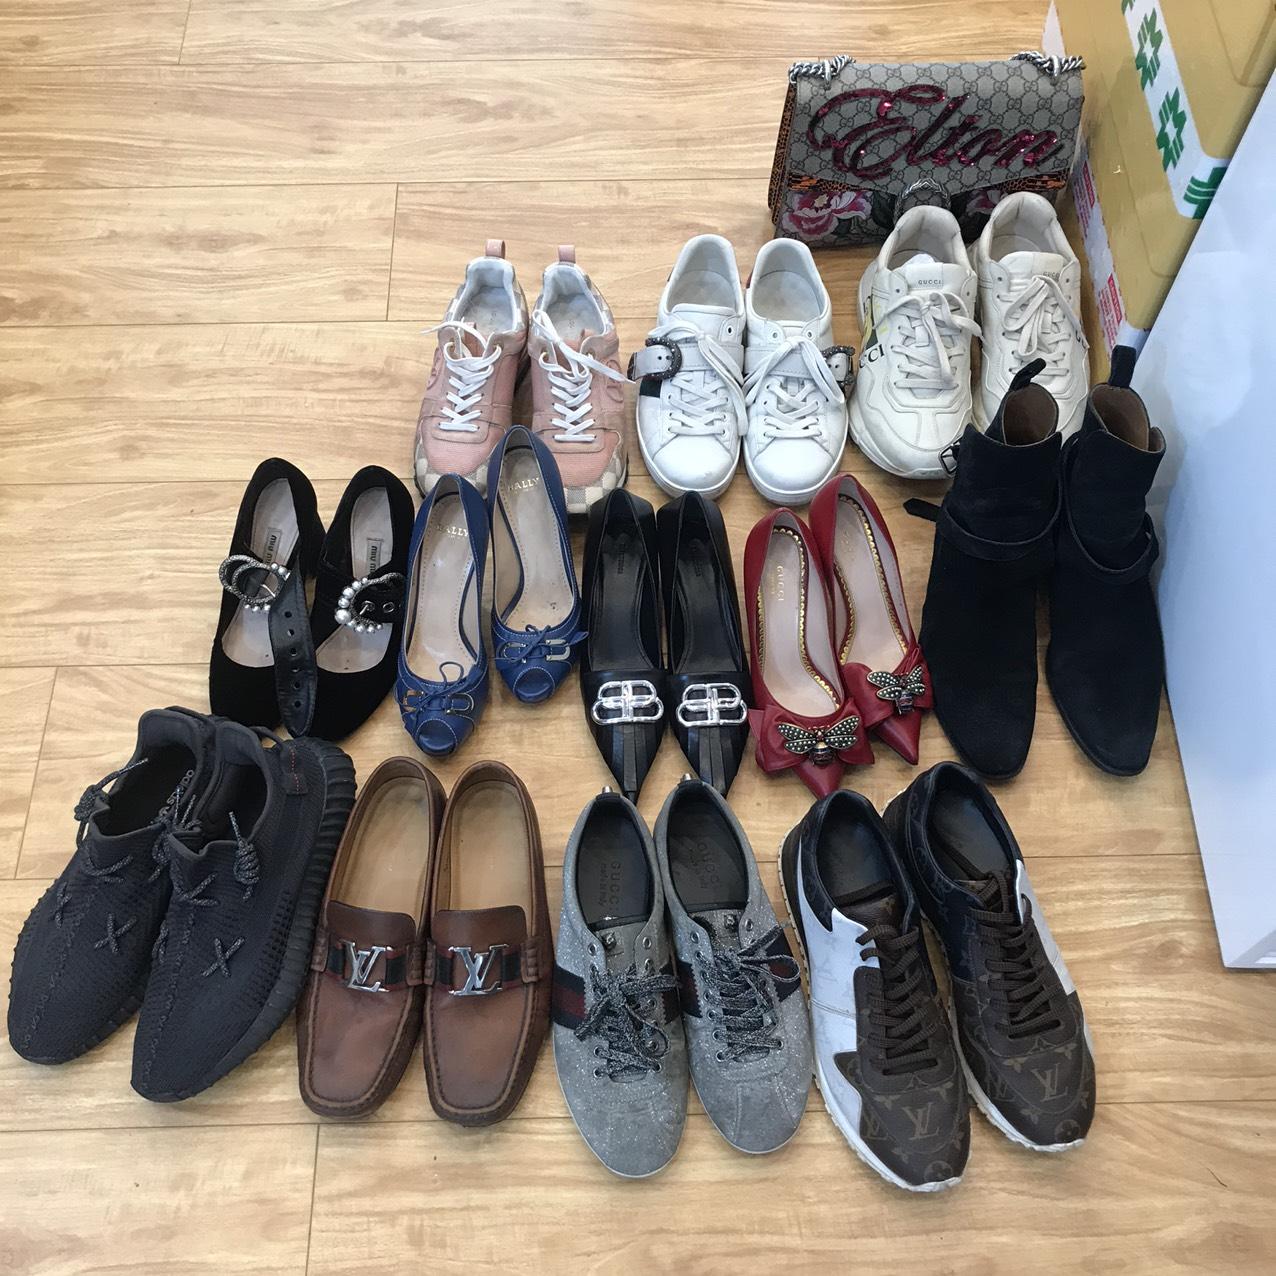 Sửa Chữa Giày Dép Gucci, Chanel, Louis Vuitton, Hermes ... 13